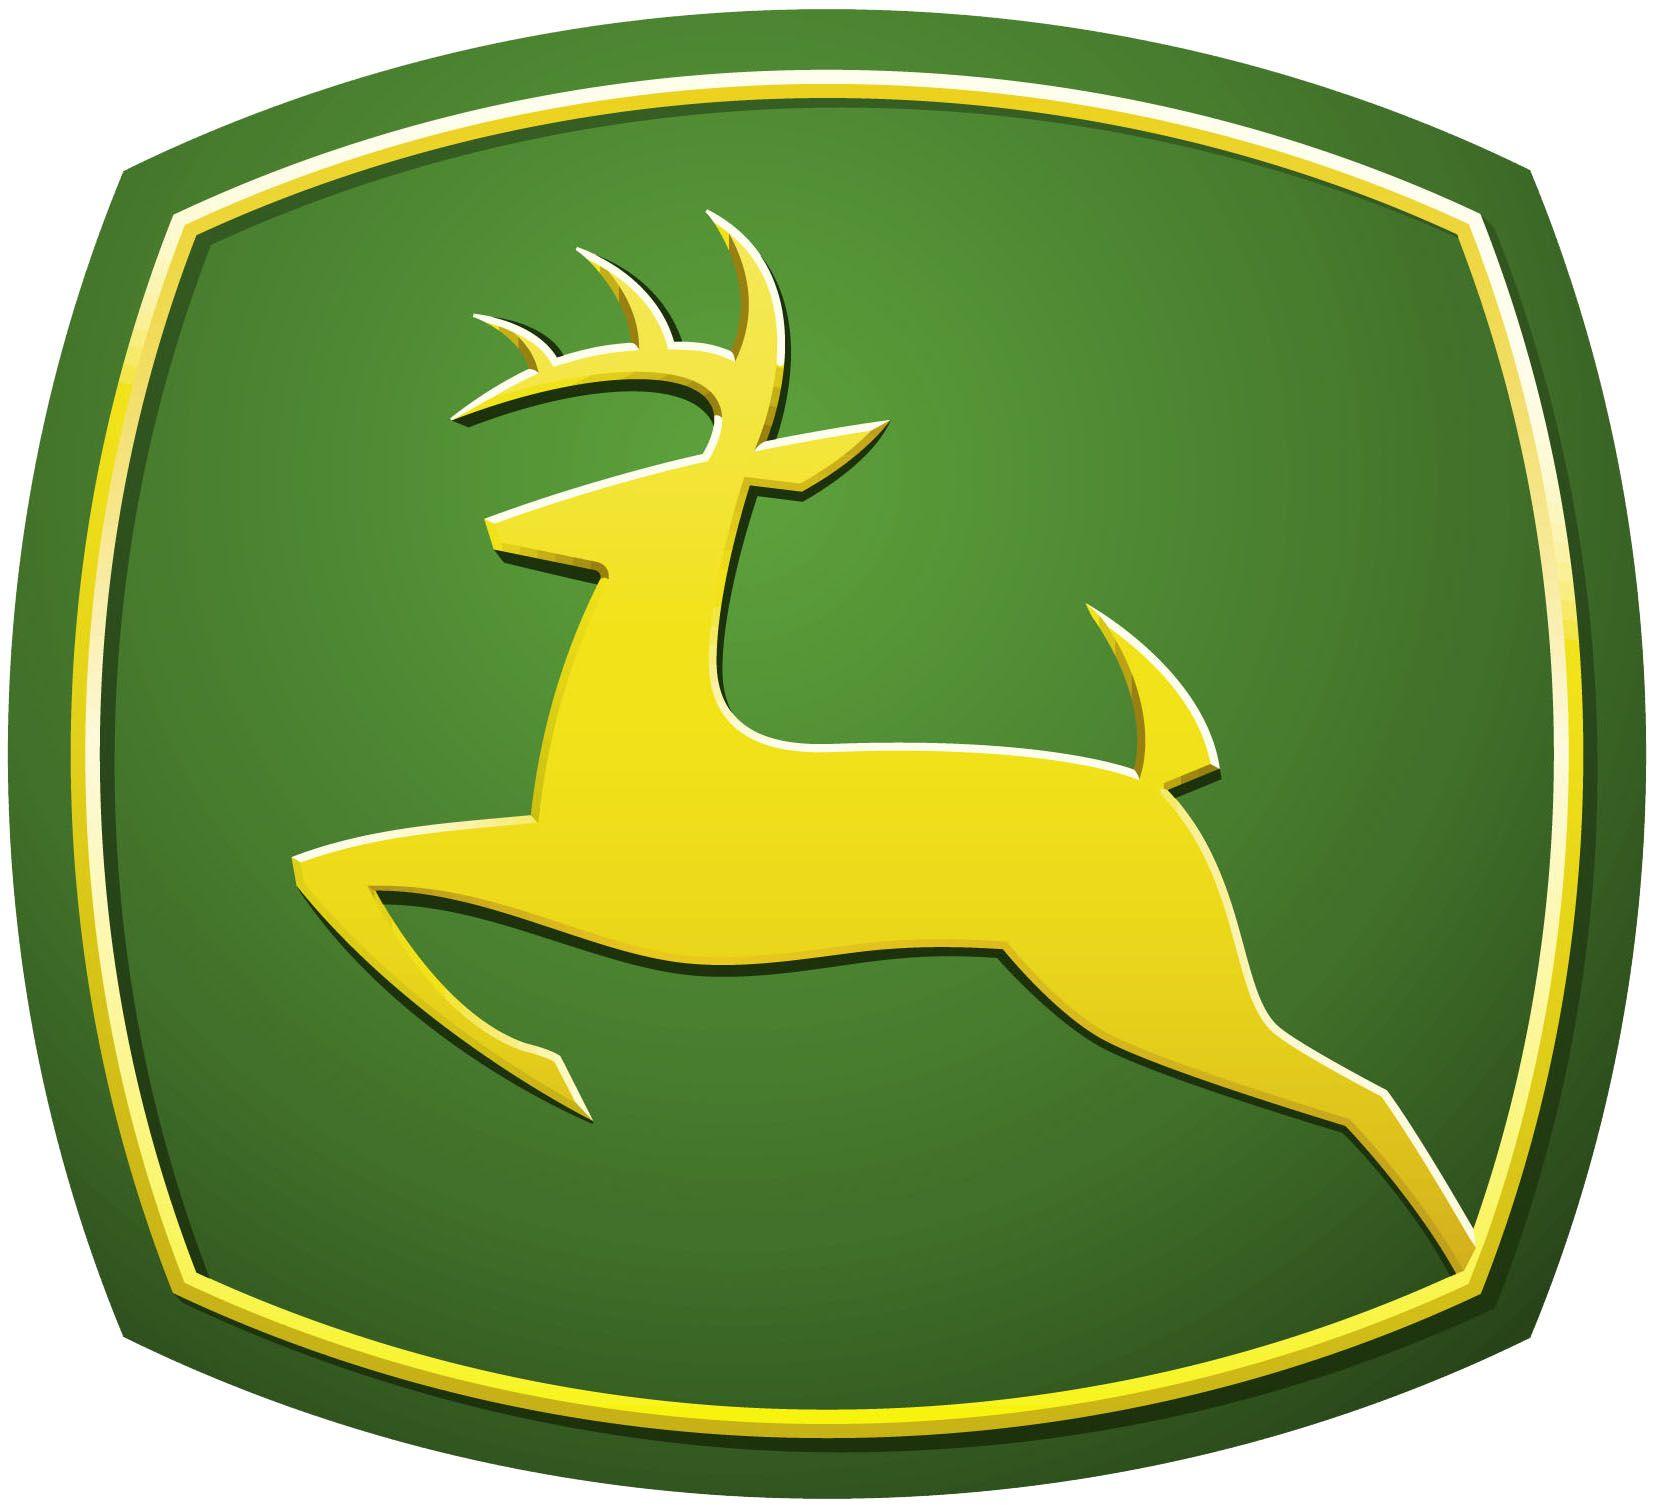 John Deere Logo Wallpaper 2015